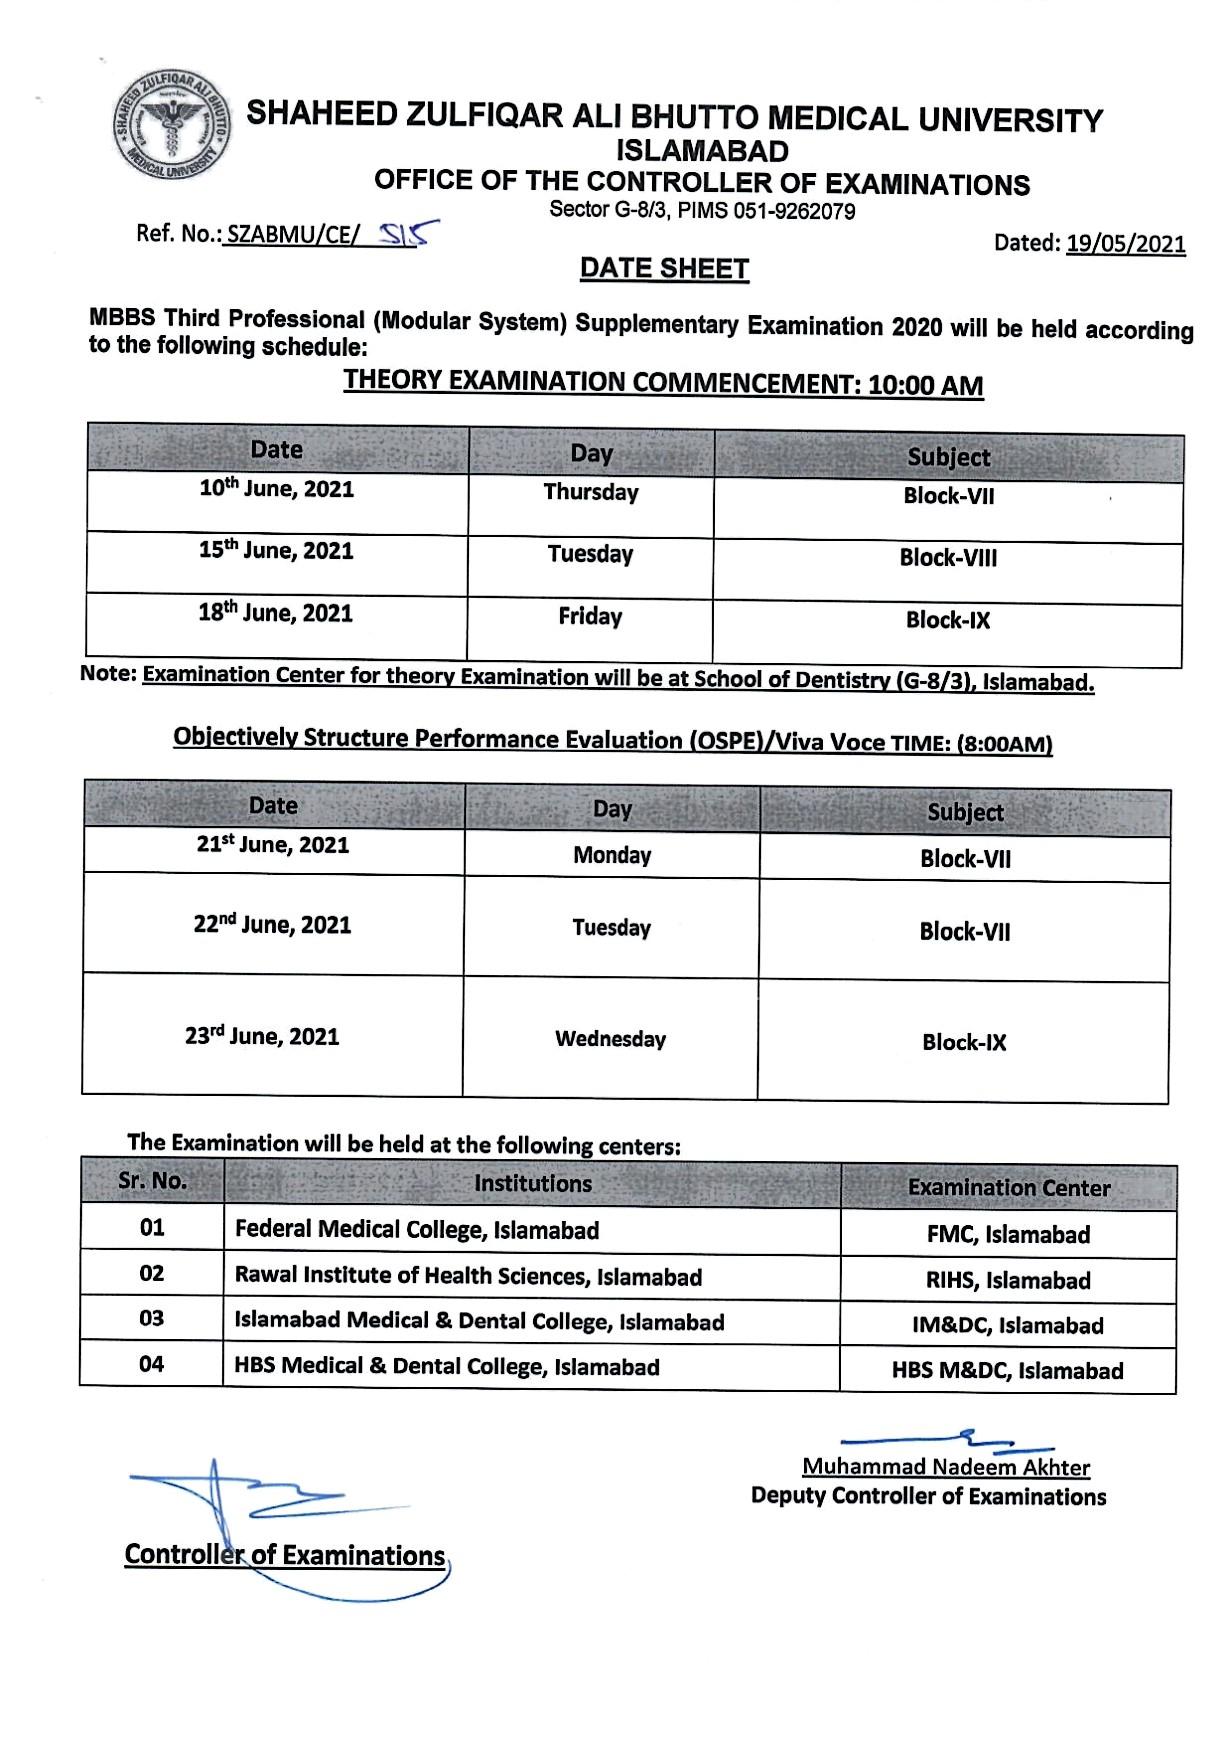 Date Sheet - MBBS Supplementary Examination 2020